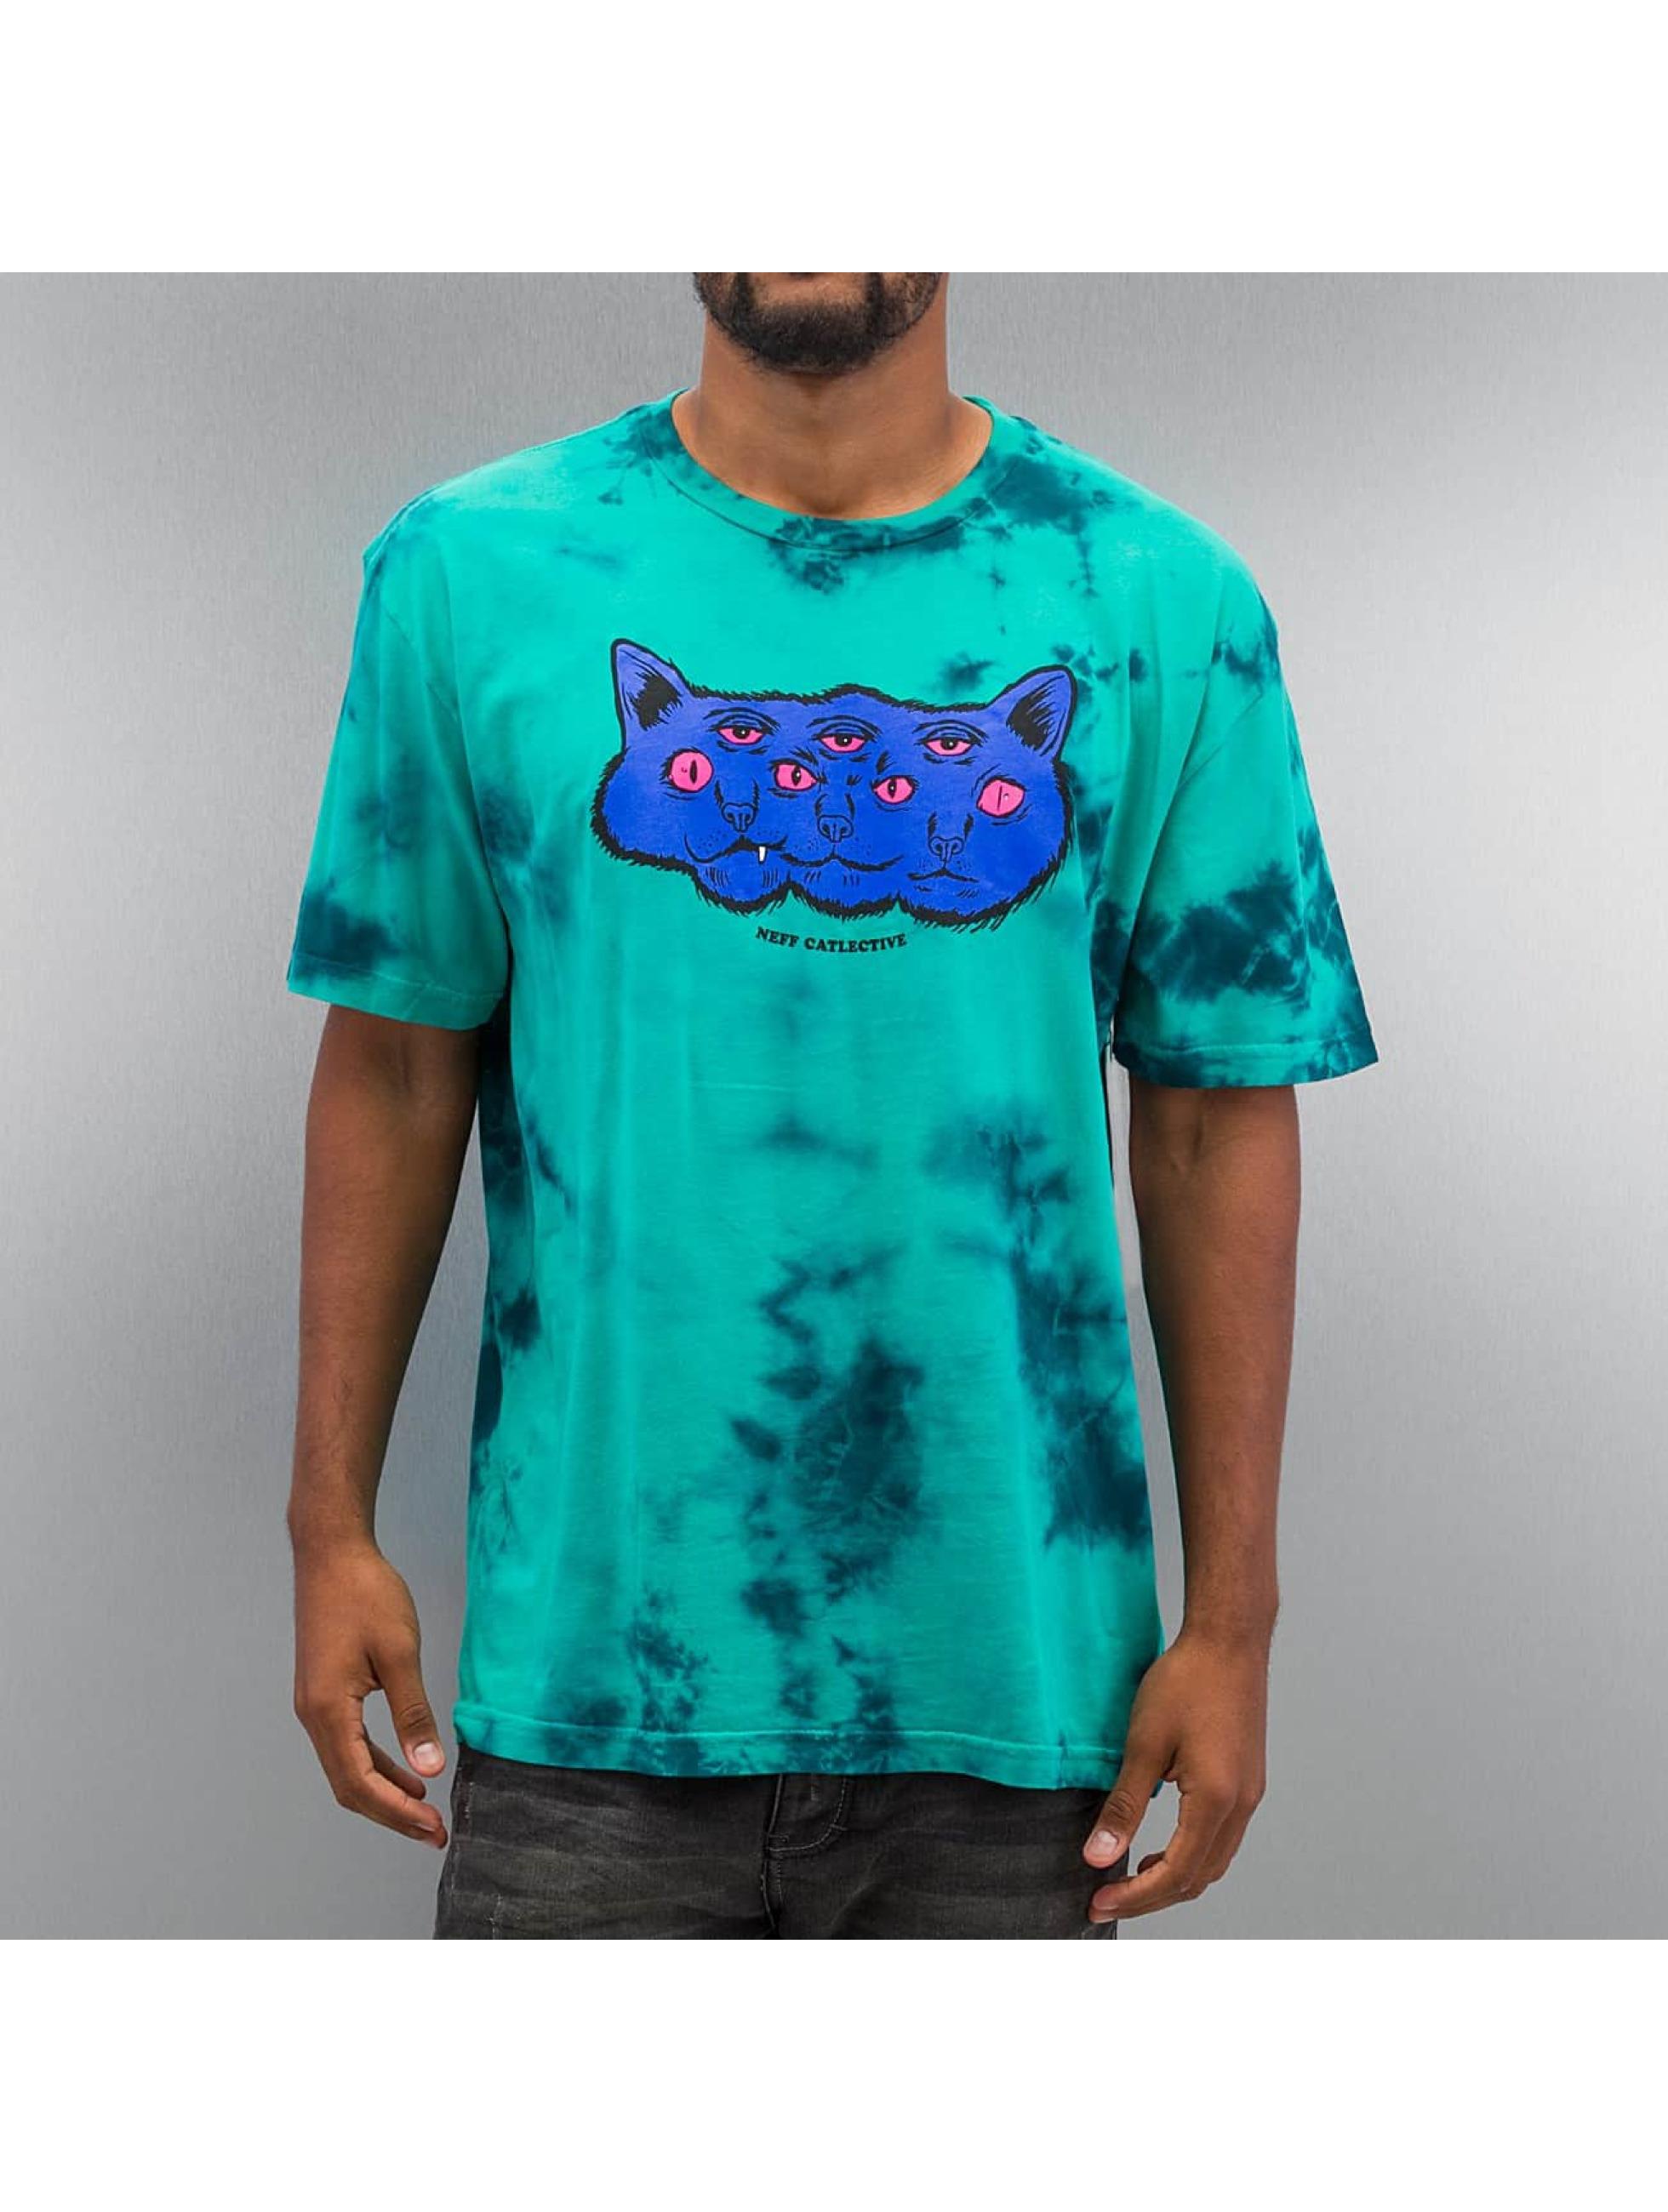 NEFF T-shirt Catlective turkos